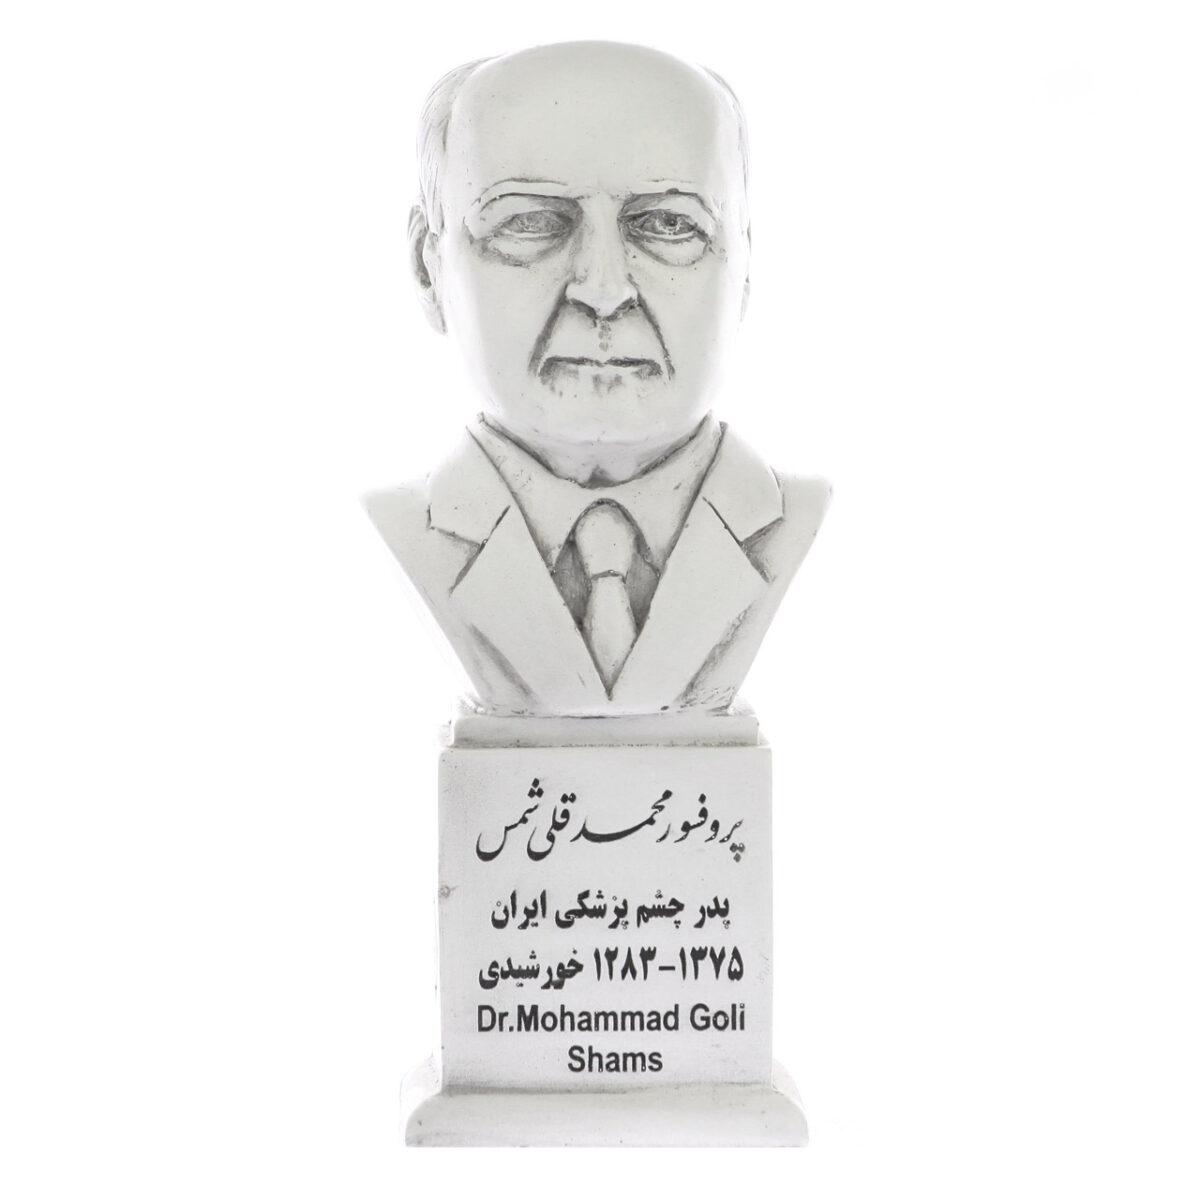 dr mohammad goli shams s 1200x1200 - سردیس پروفسور محمدقلی شمس